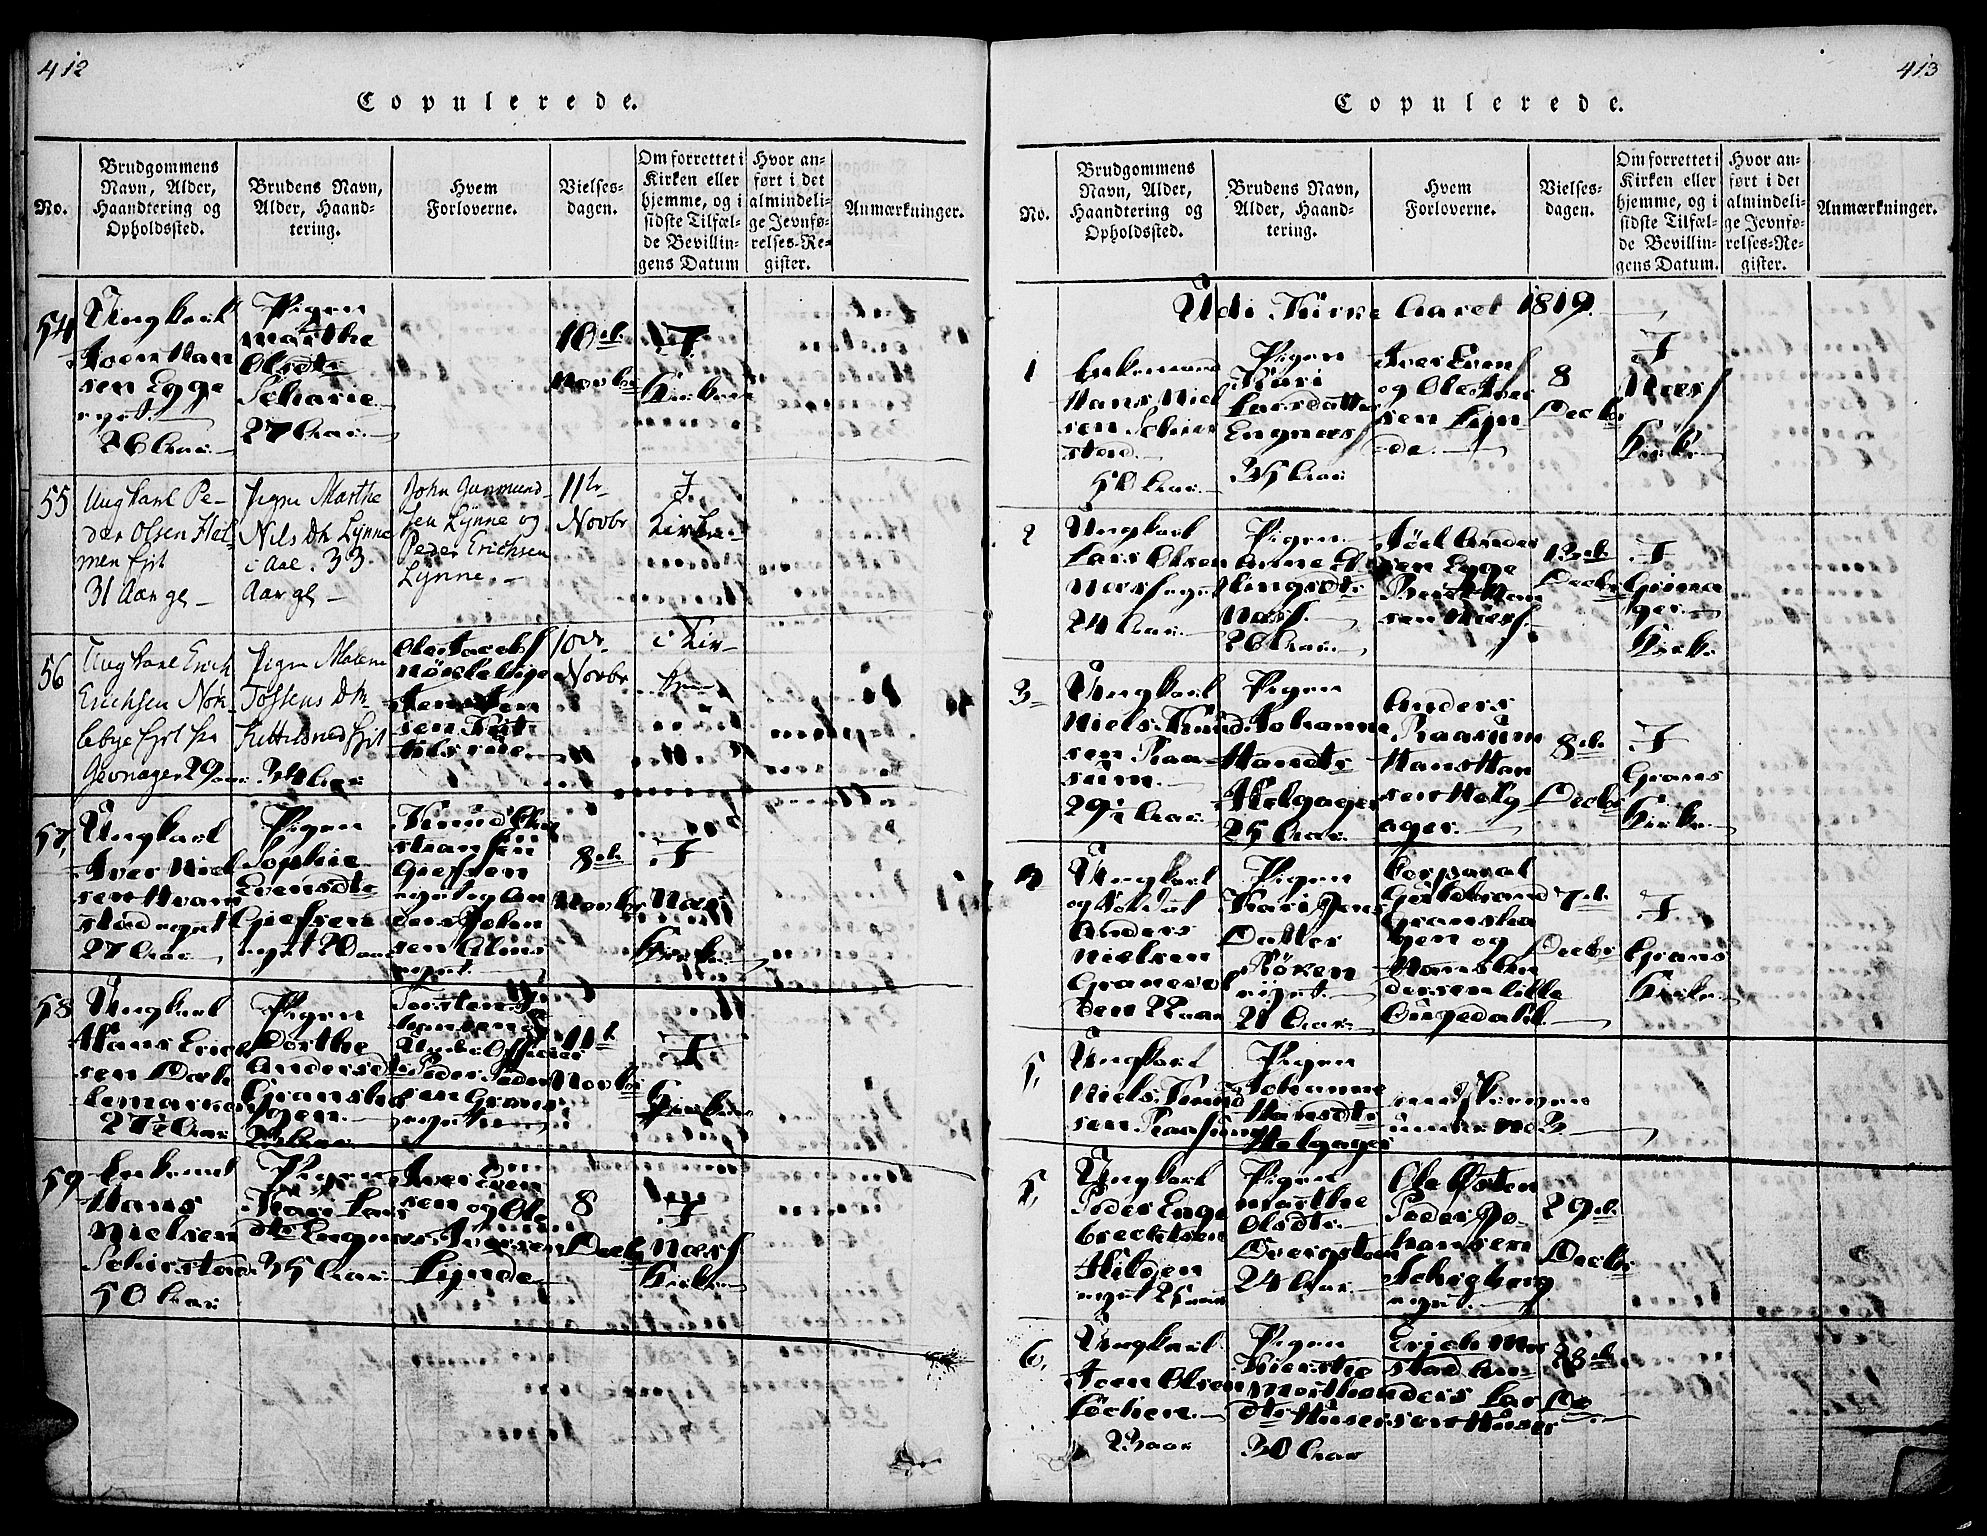 SAH, Gran prestekontor, Ministerialbok nr. 9, 1815-1824, s. 412-413